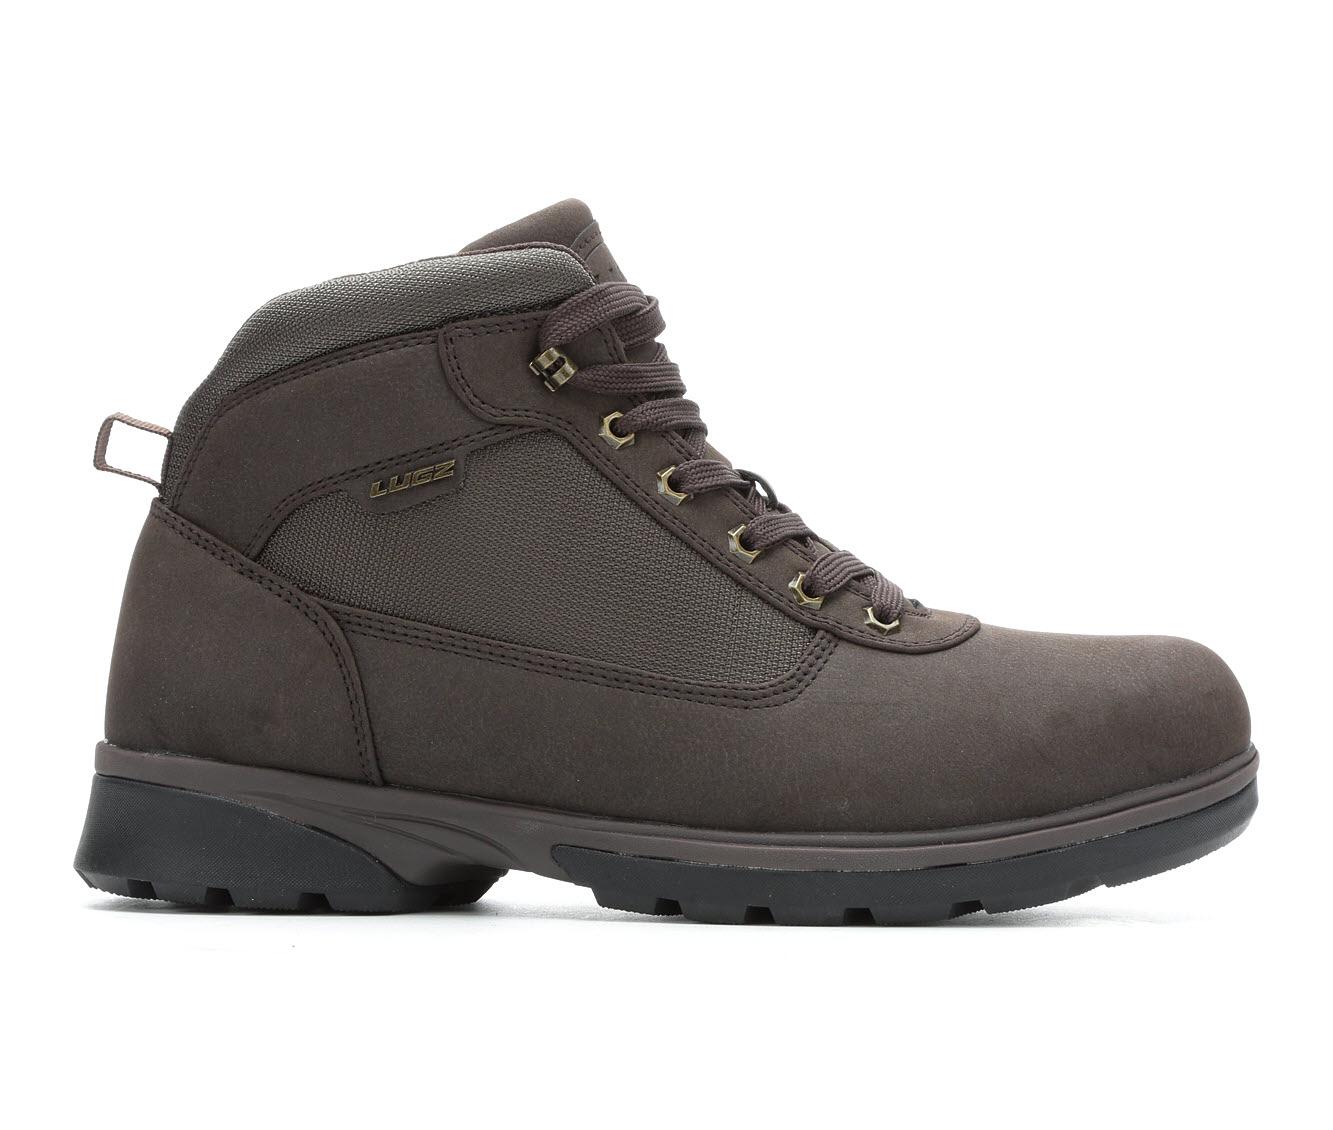 Lugz Zeolite Men's Boots (Brown Faux Leather)